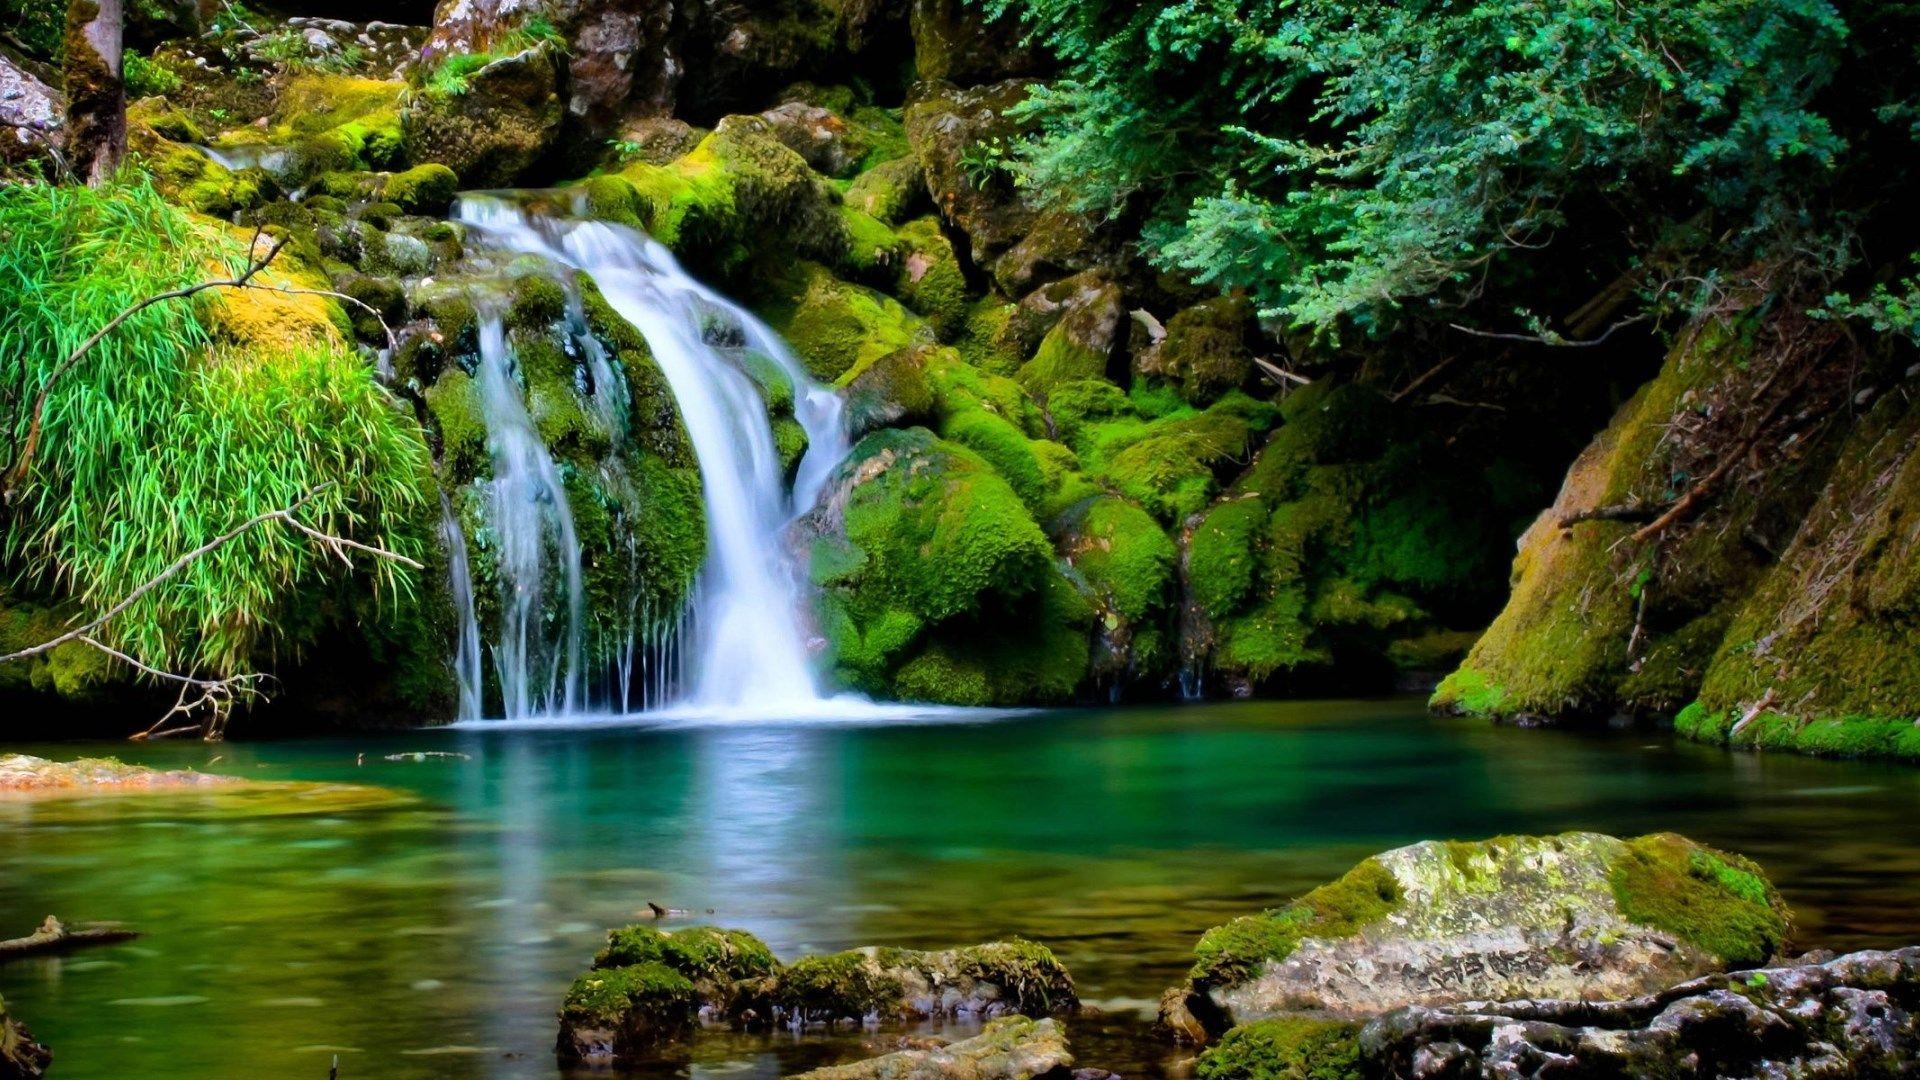 3d Laptop Wallpapers For Desktop Waterfall Scenery Beautiful Nature Wallpaper Waterfall Wallpaper